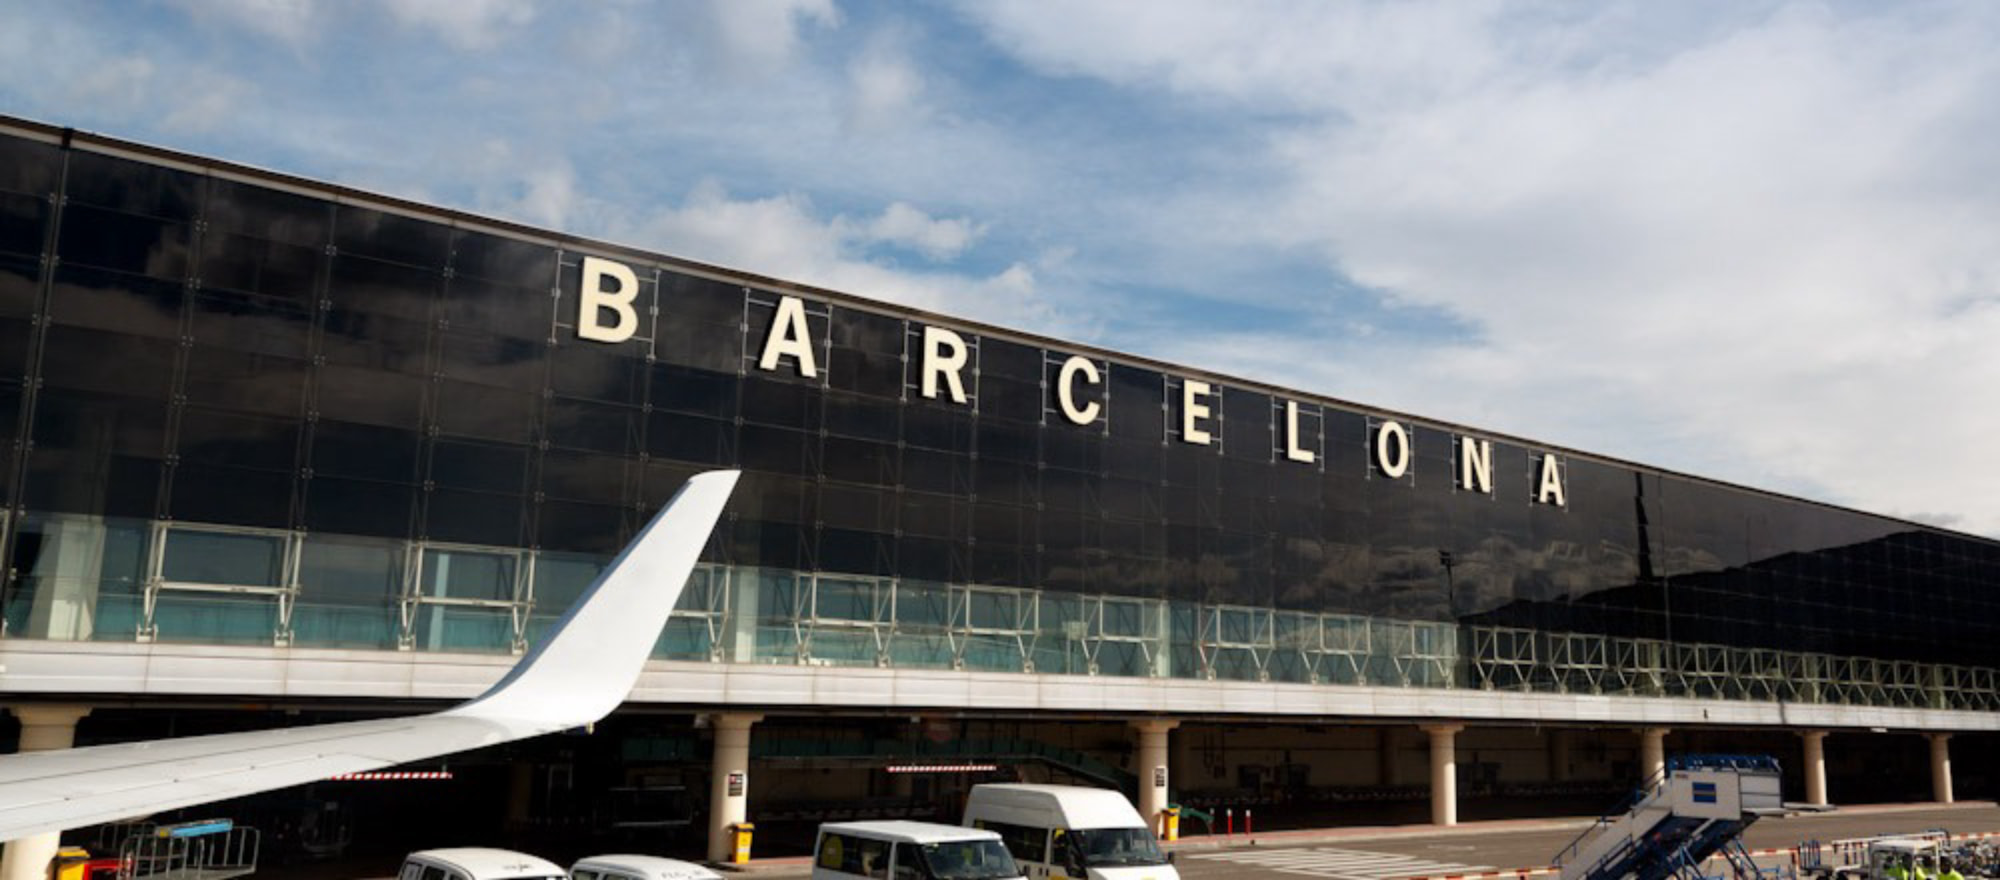 Spain. Getting to Barcelona - El Prat Airport